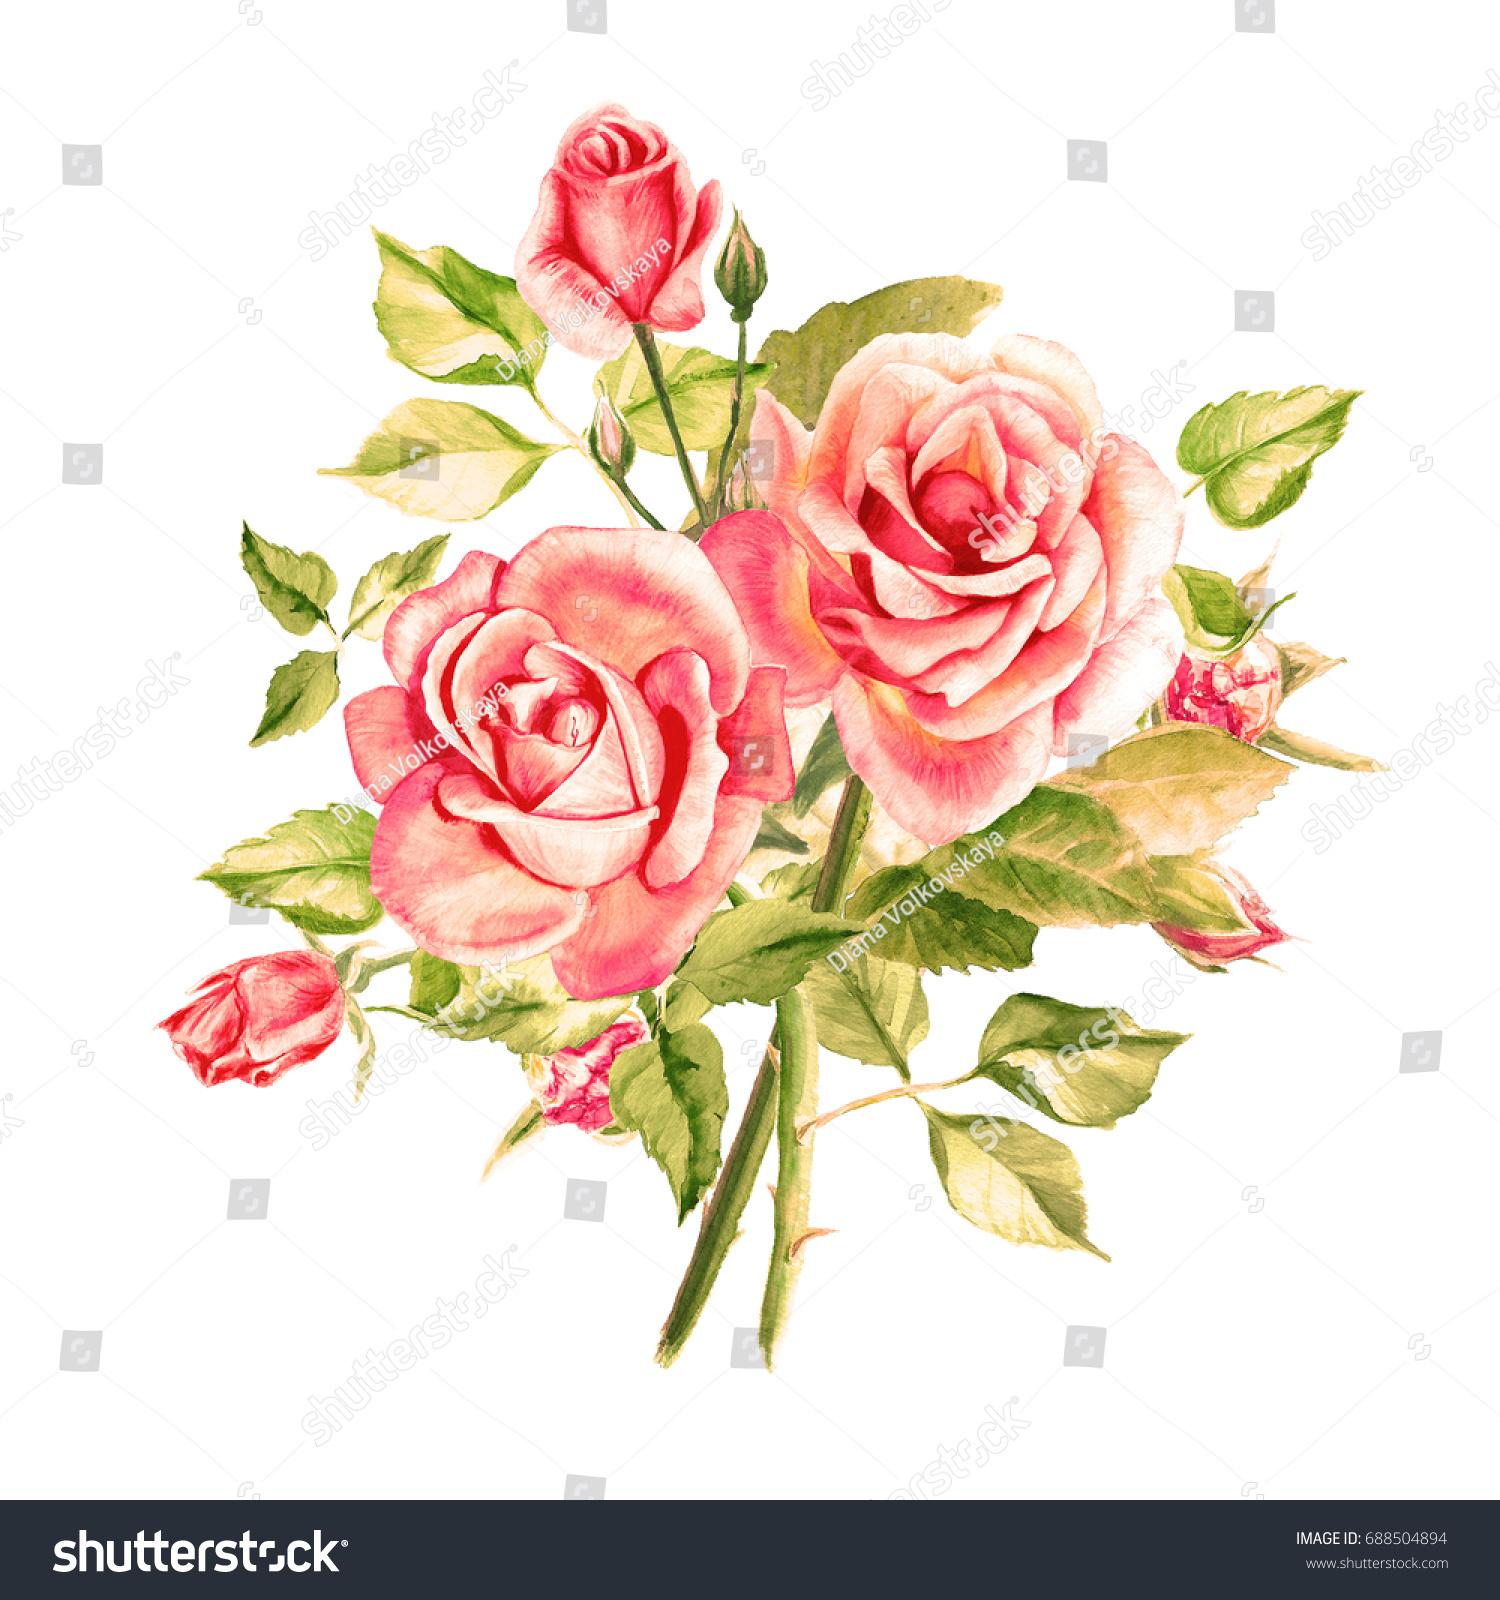 Watercolor pink roses bouquet roses rose stock illustration watercolor pink roses bouquet of roses rose bush beautiful flowers watercolor painting izmirmasajfo